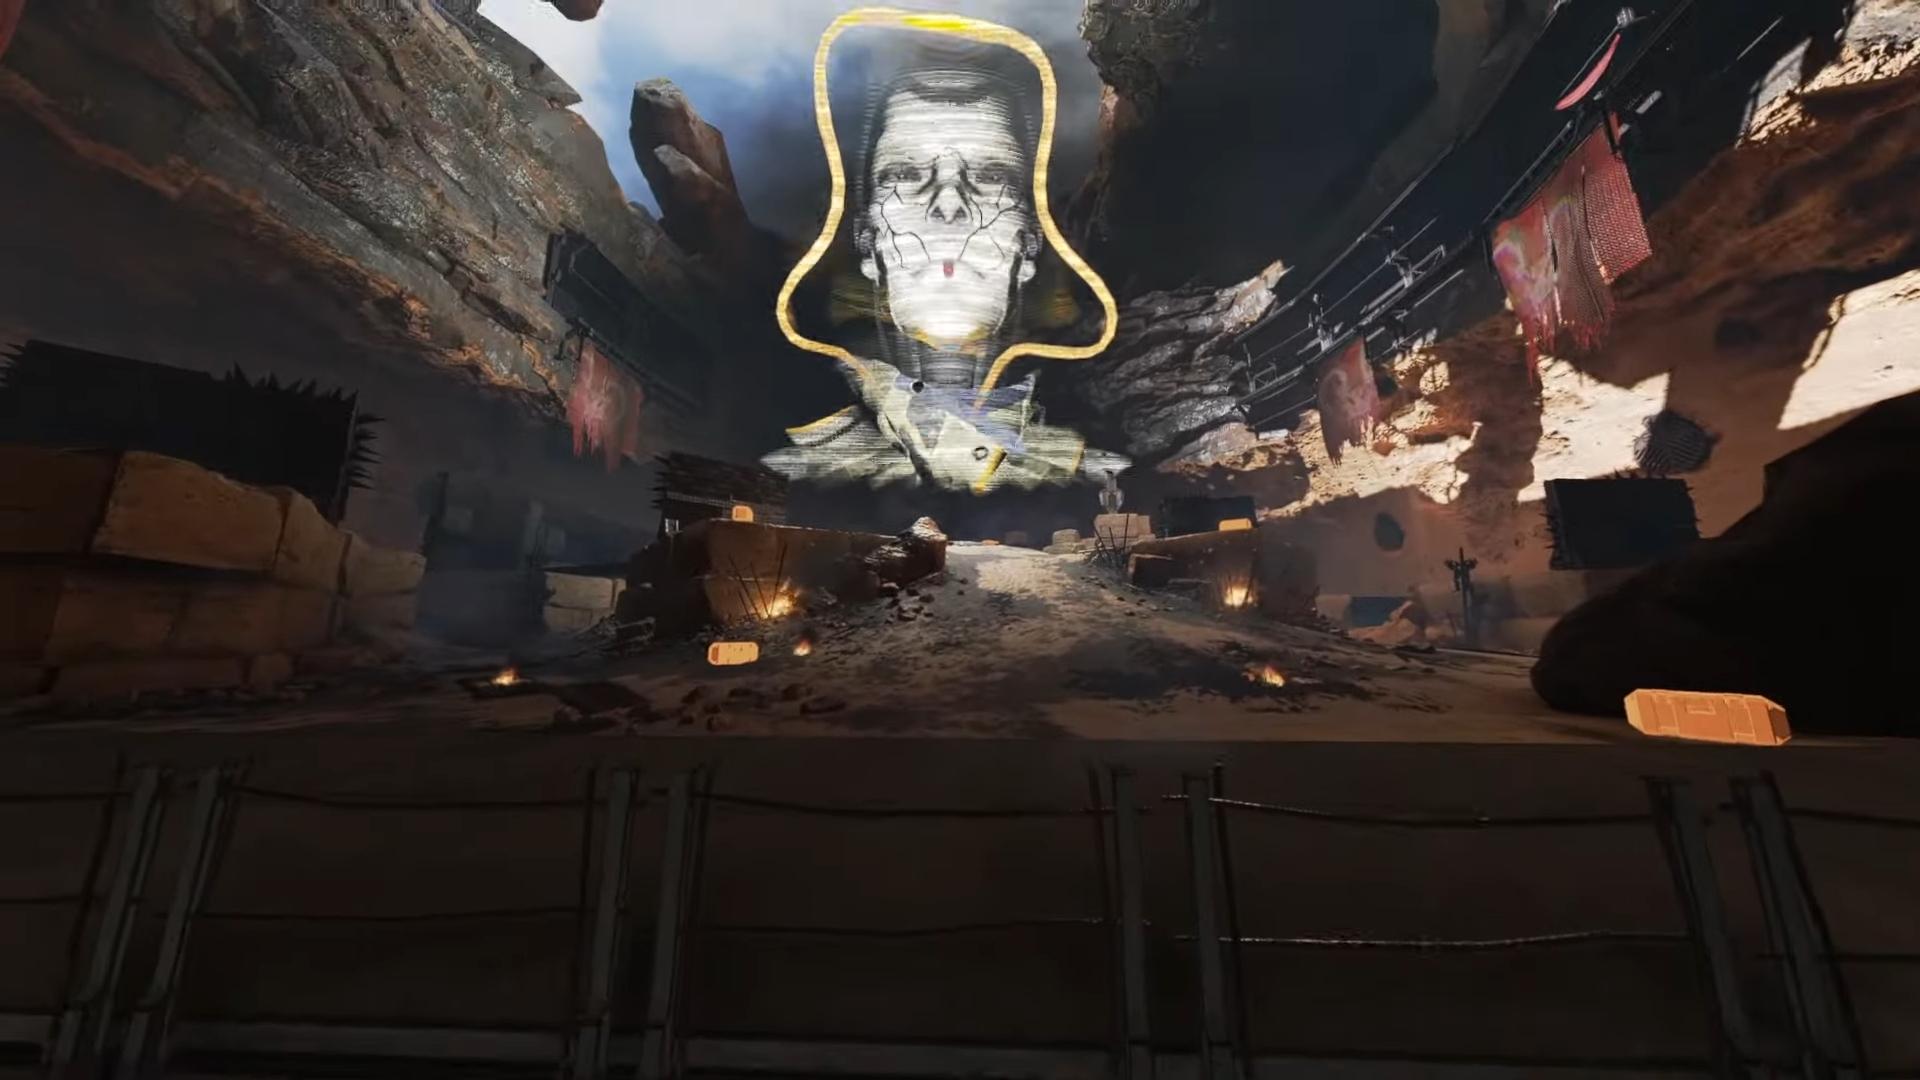 【APEX】今後誰でもゲーム内で見れるようになる「アリーナモード」のティザー動画がリーク!!